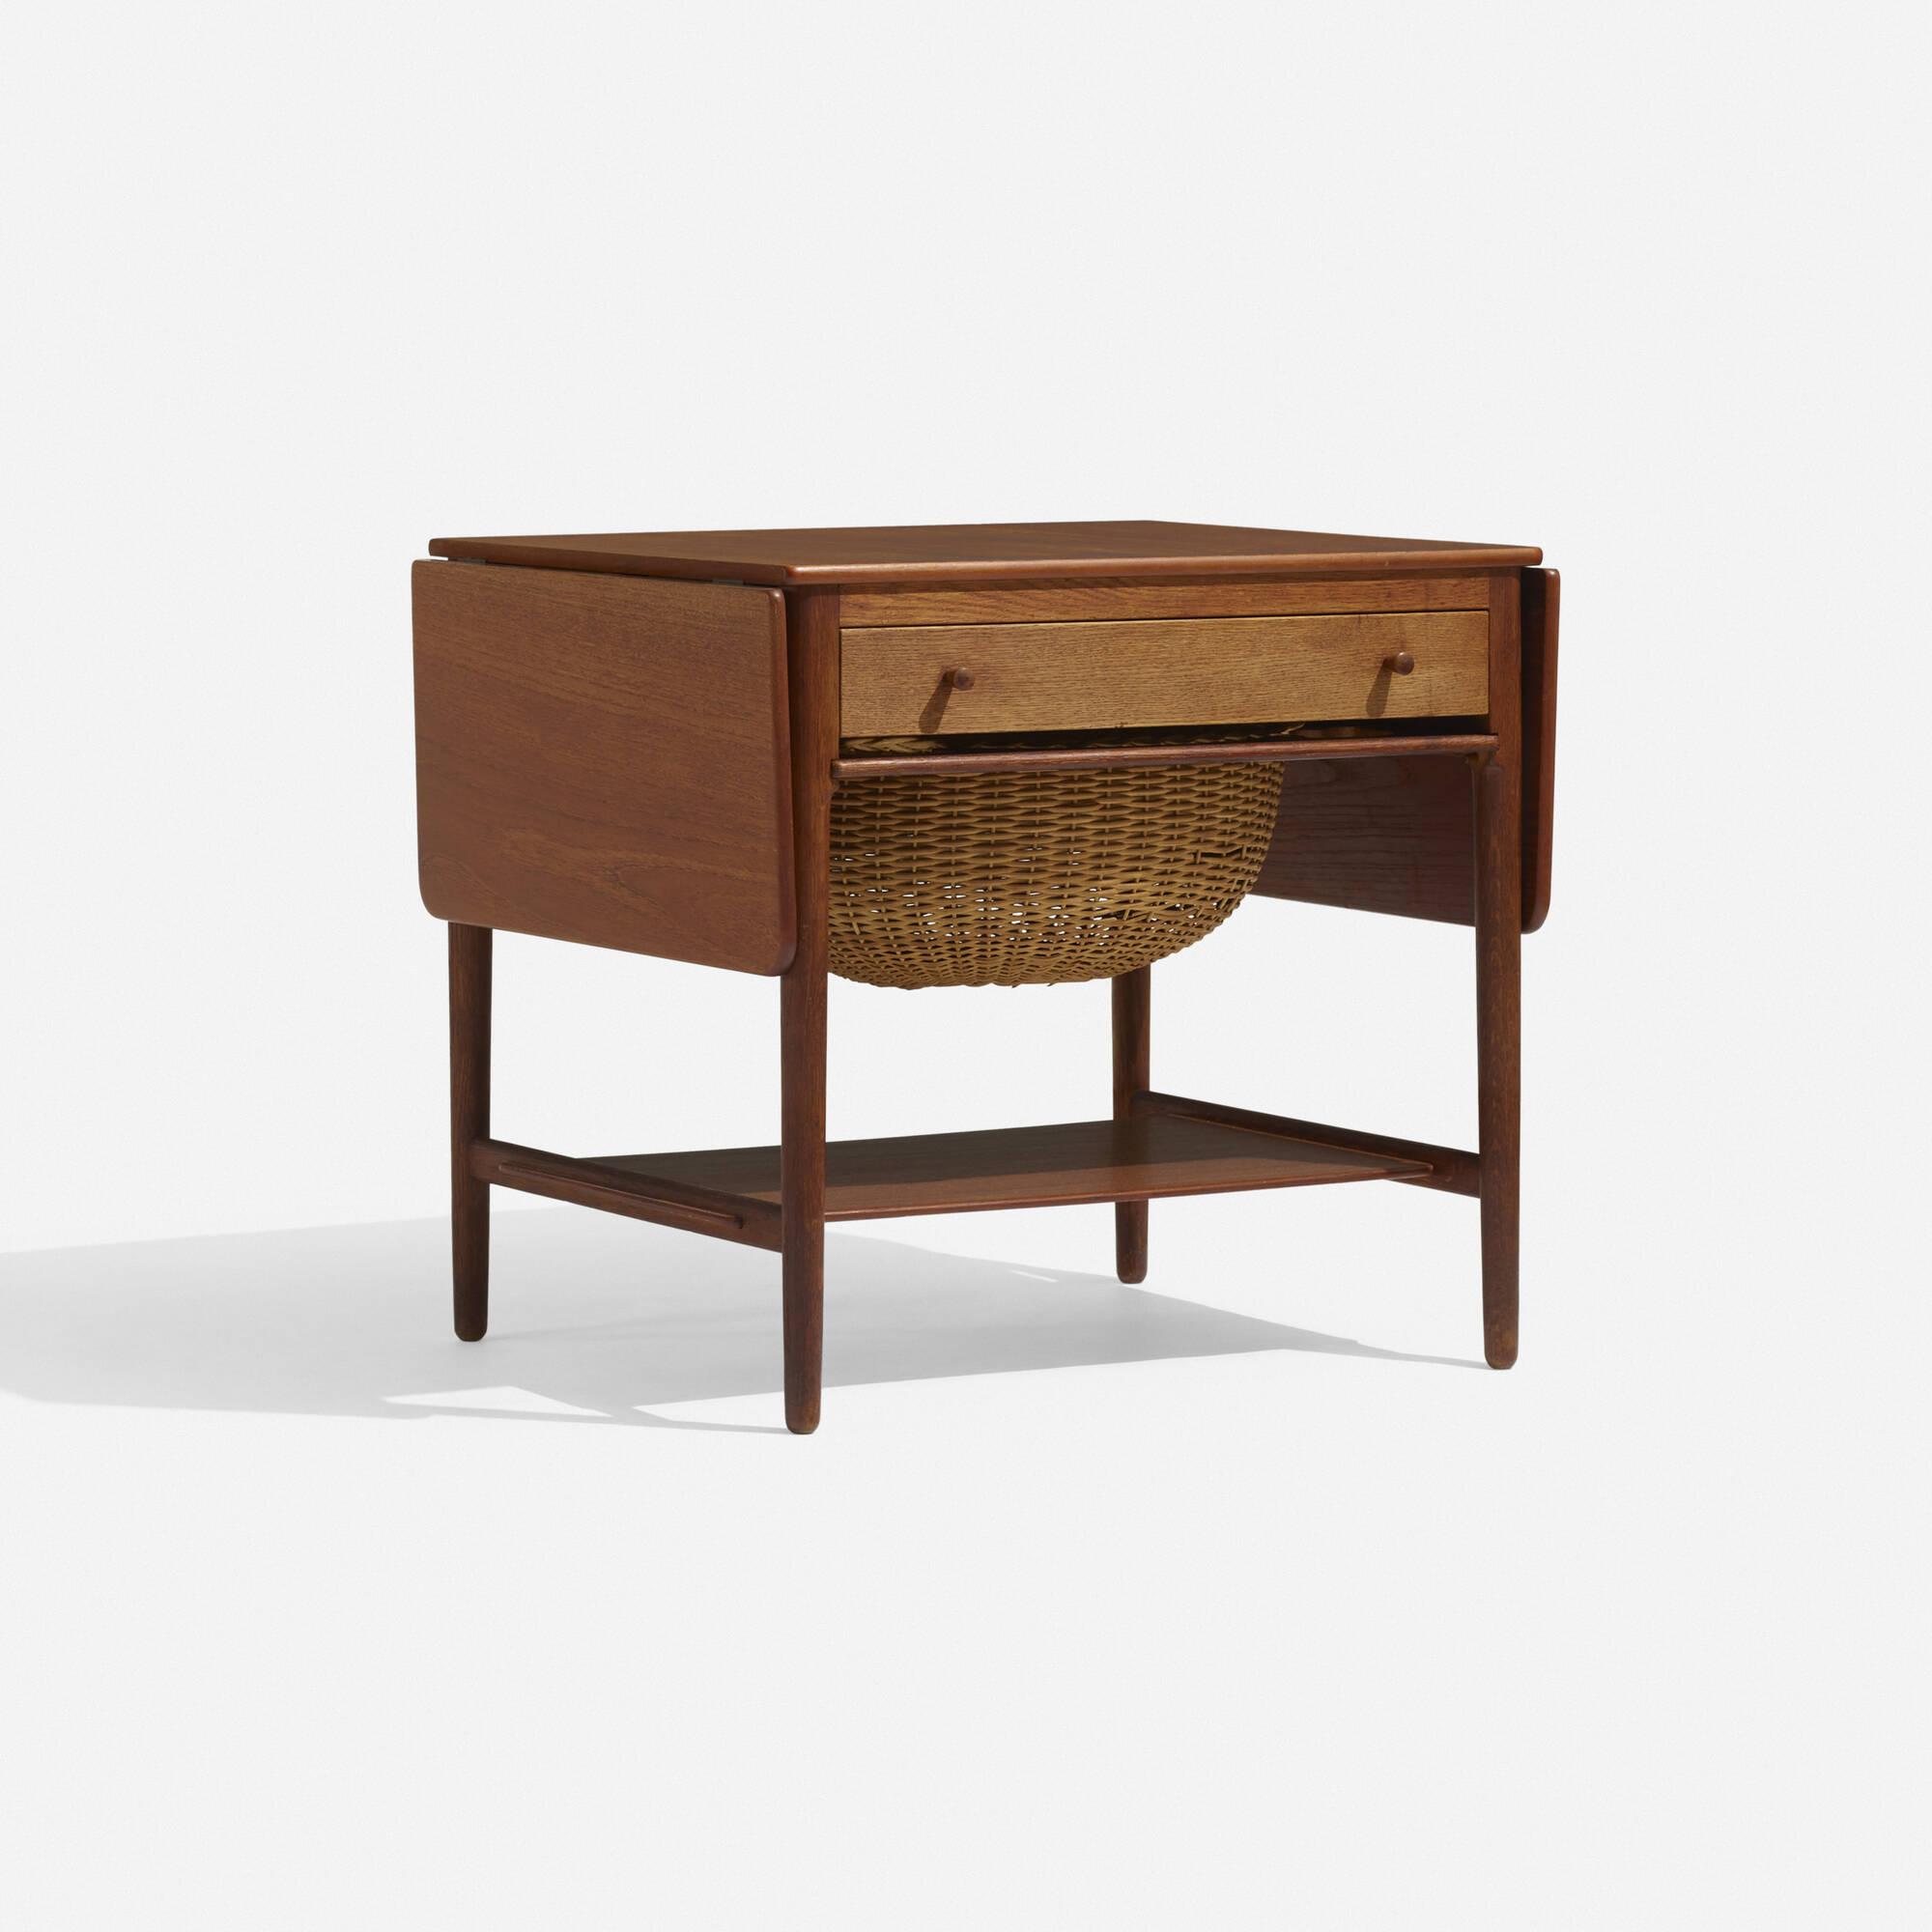 287: Hans J. Wegner / sewing table, model AT 33 (1 of 3)